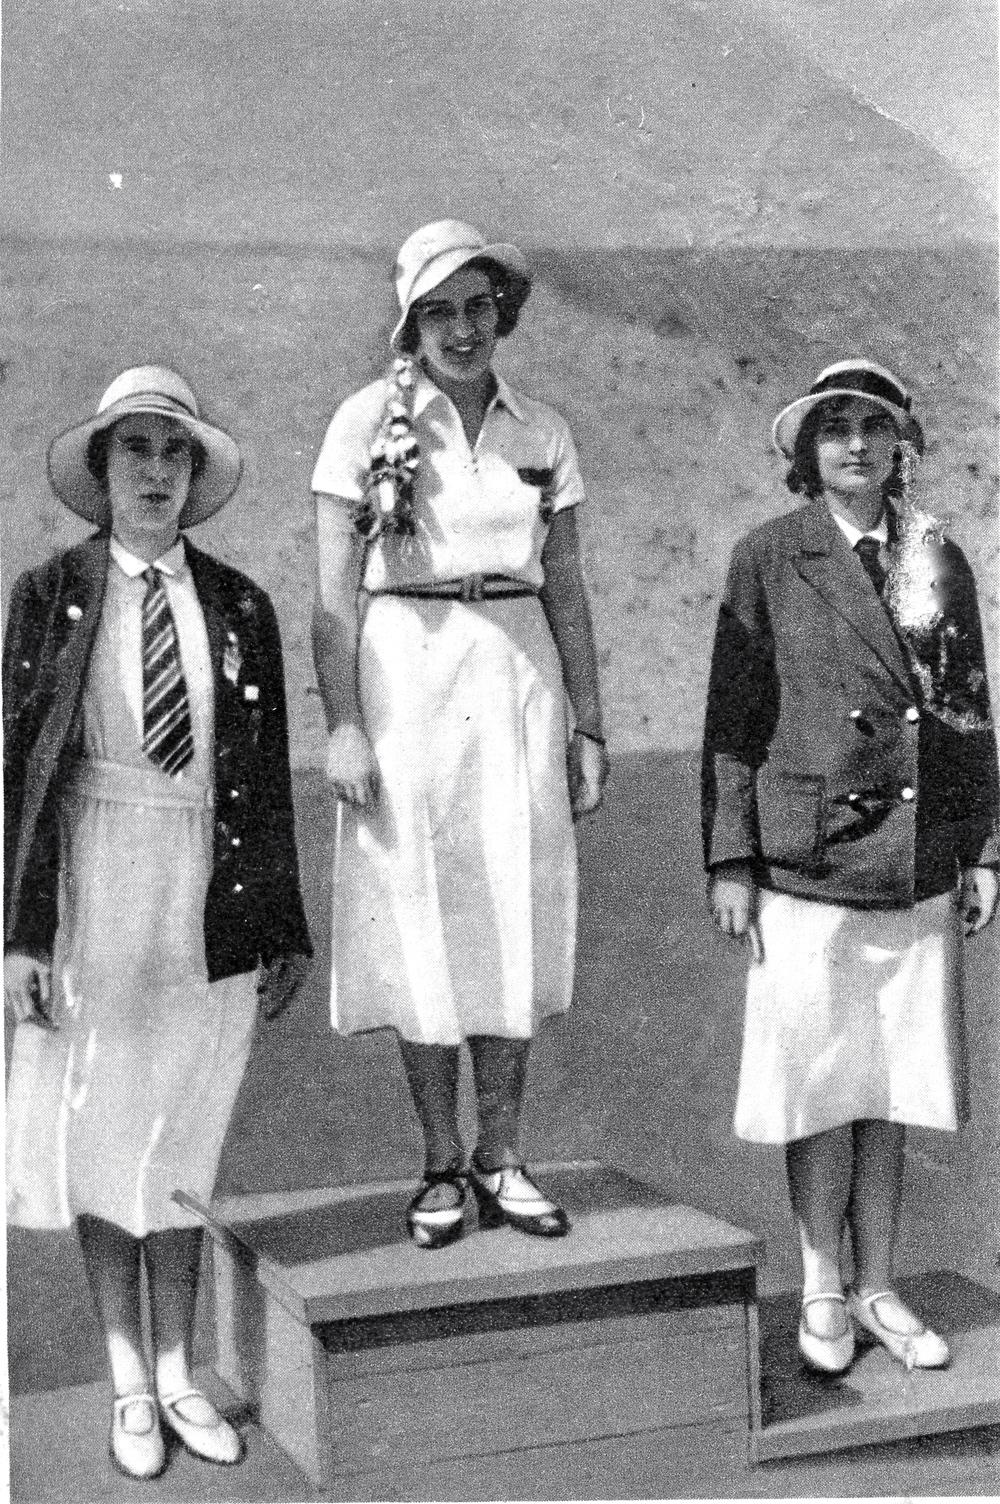 1932 Olympics Medalists Fencing Foil    1. Ellen Preis - Osterreich    2. Heather Seymour Guiness - England    3.Erna Bogen - Ungarn